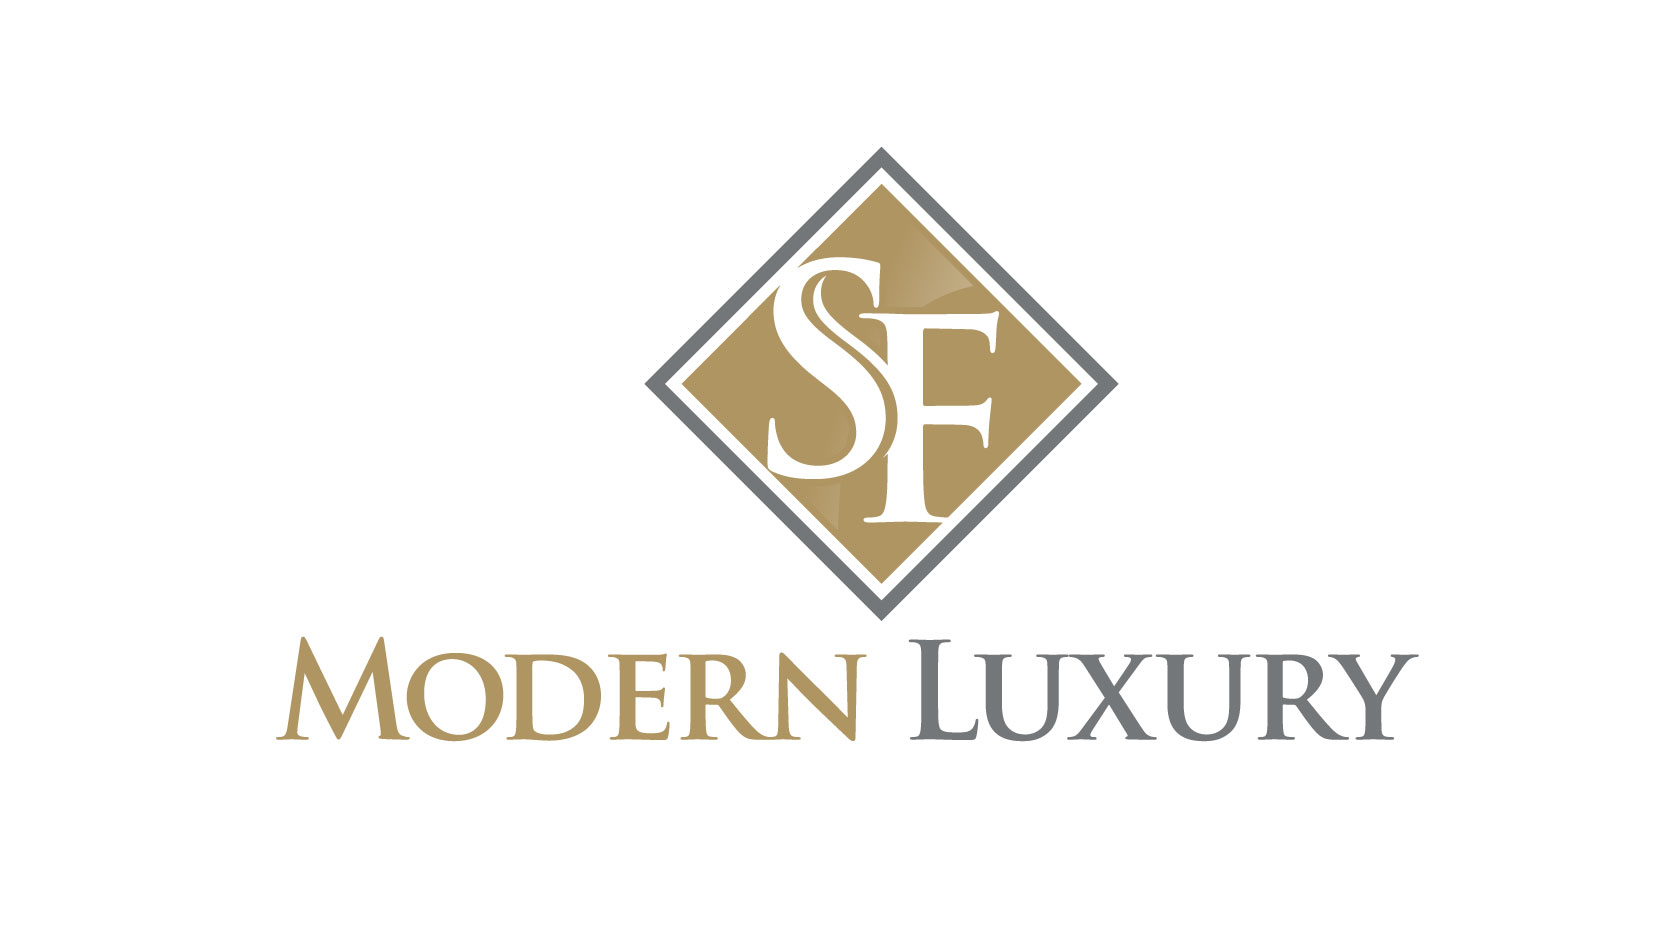 SF Modern Luxury | Local San Francisco Real Estate Updates